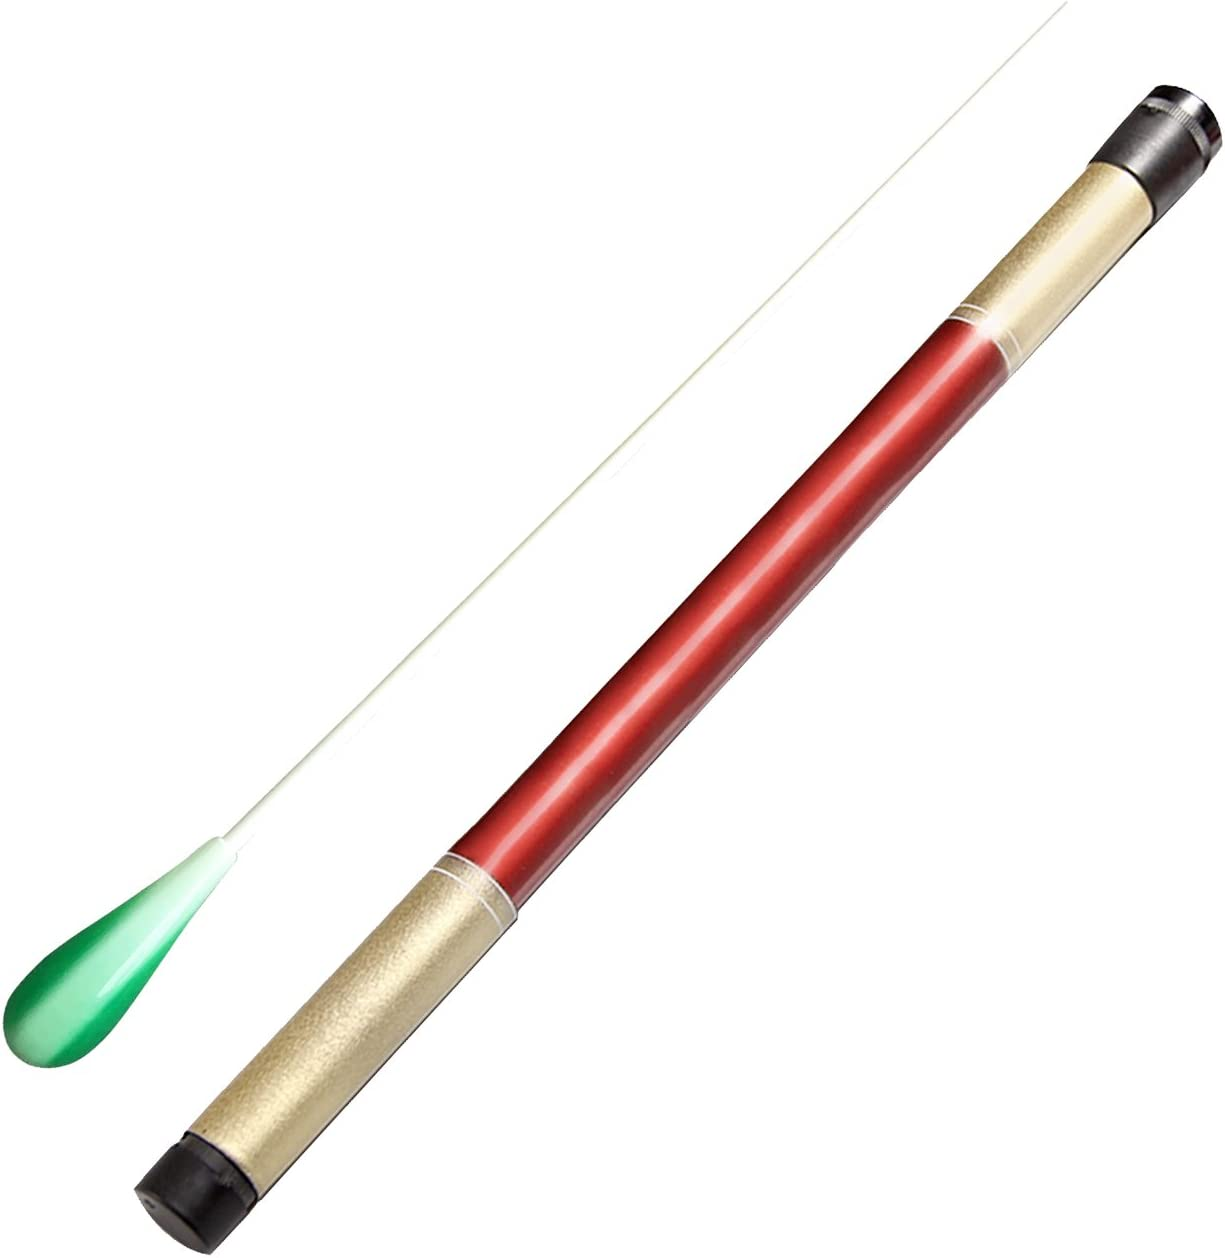 Music Conductor Batons Imitation Agate Handle Conducti Popular standard Long-awaited Orchestra